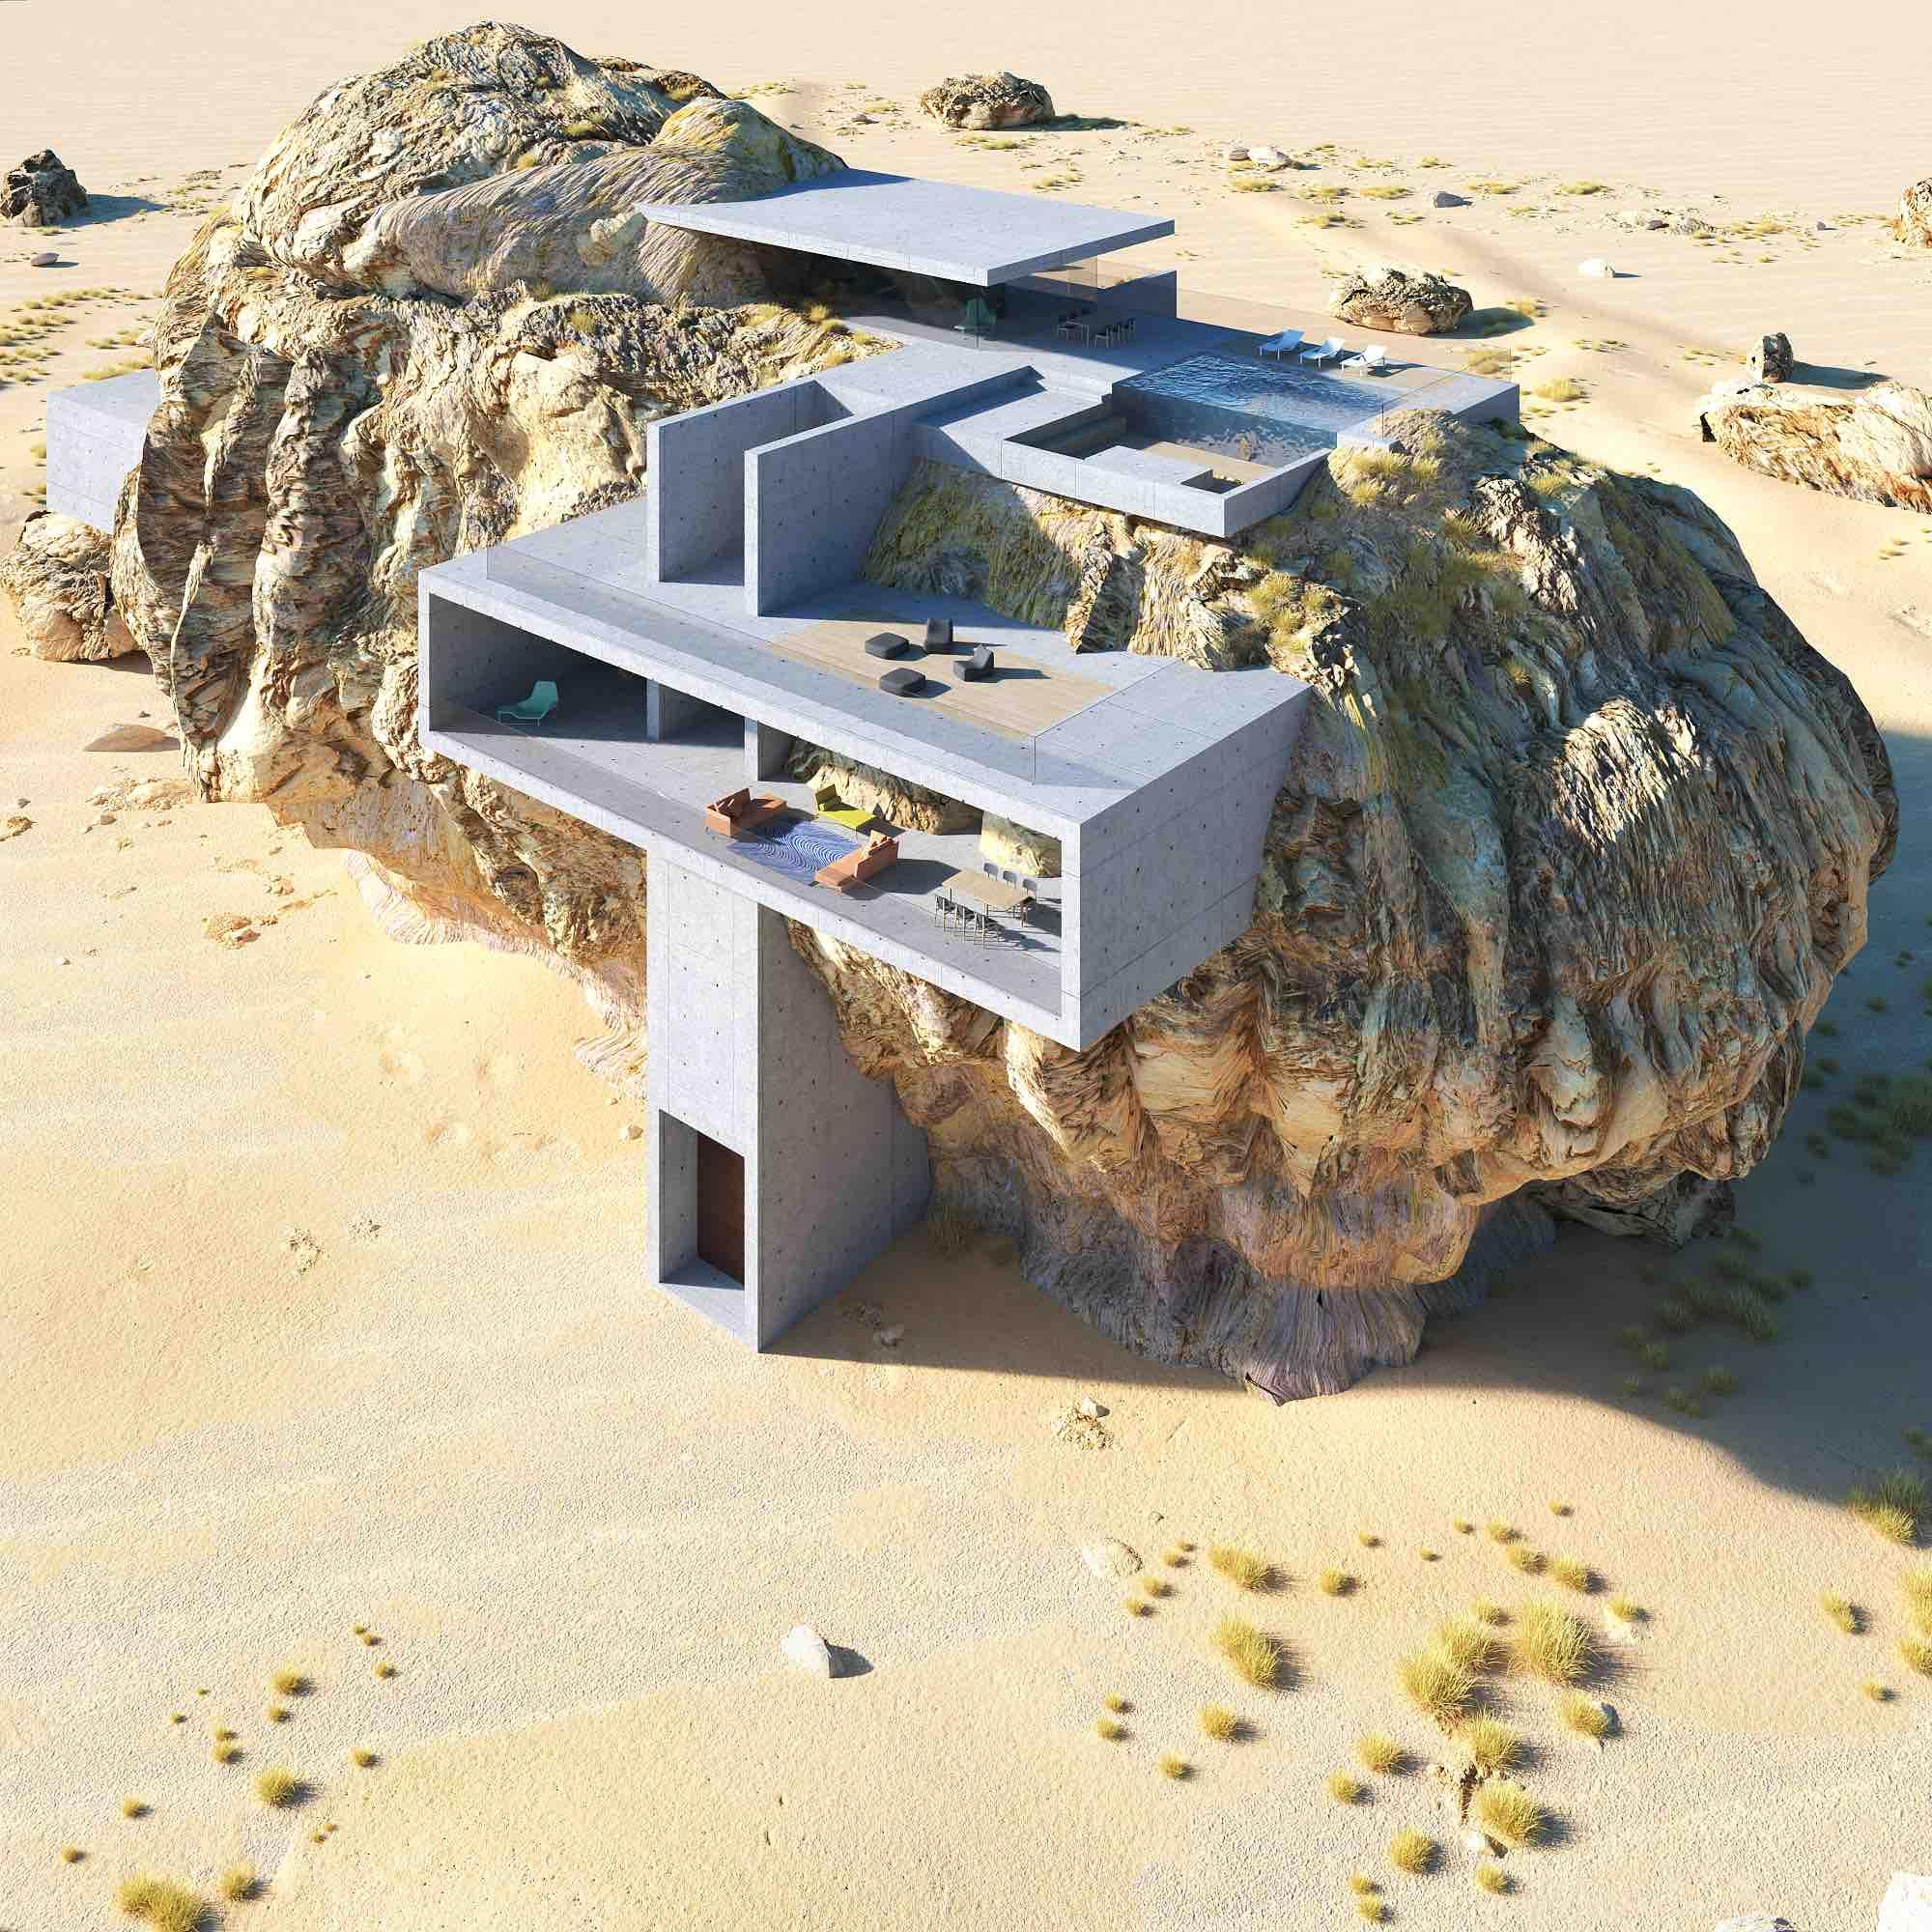 House-inside-a-rock-Amey-Kandalgaonkar-SaudiArabia-002.jpg